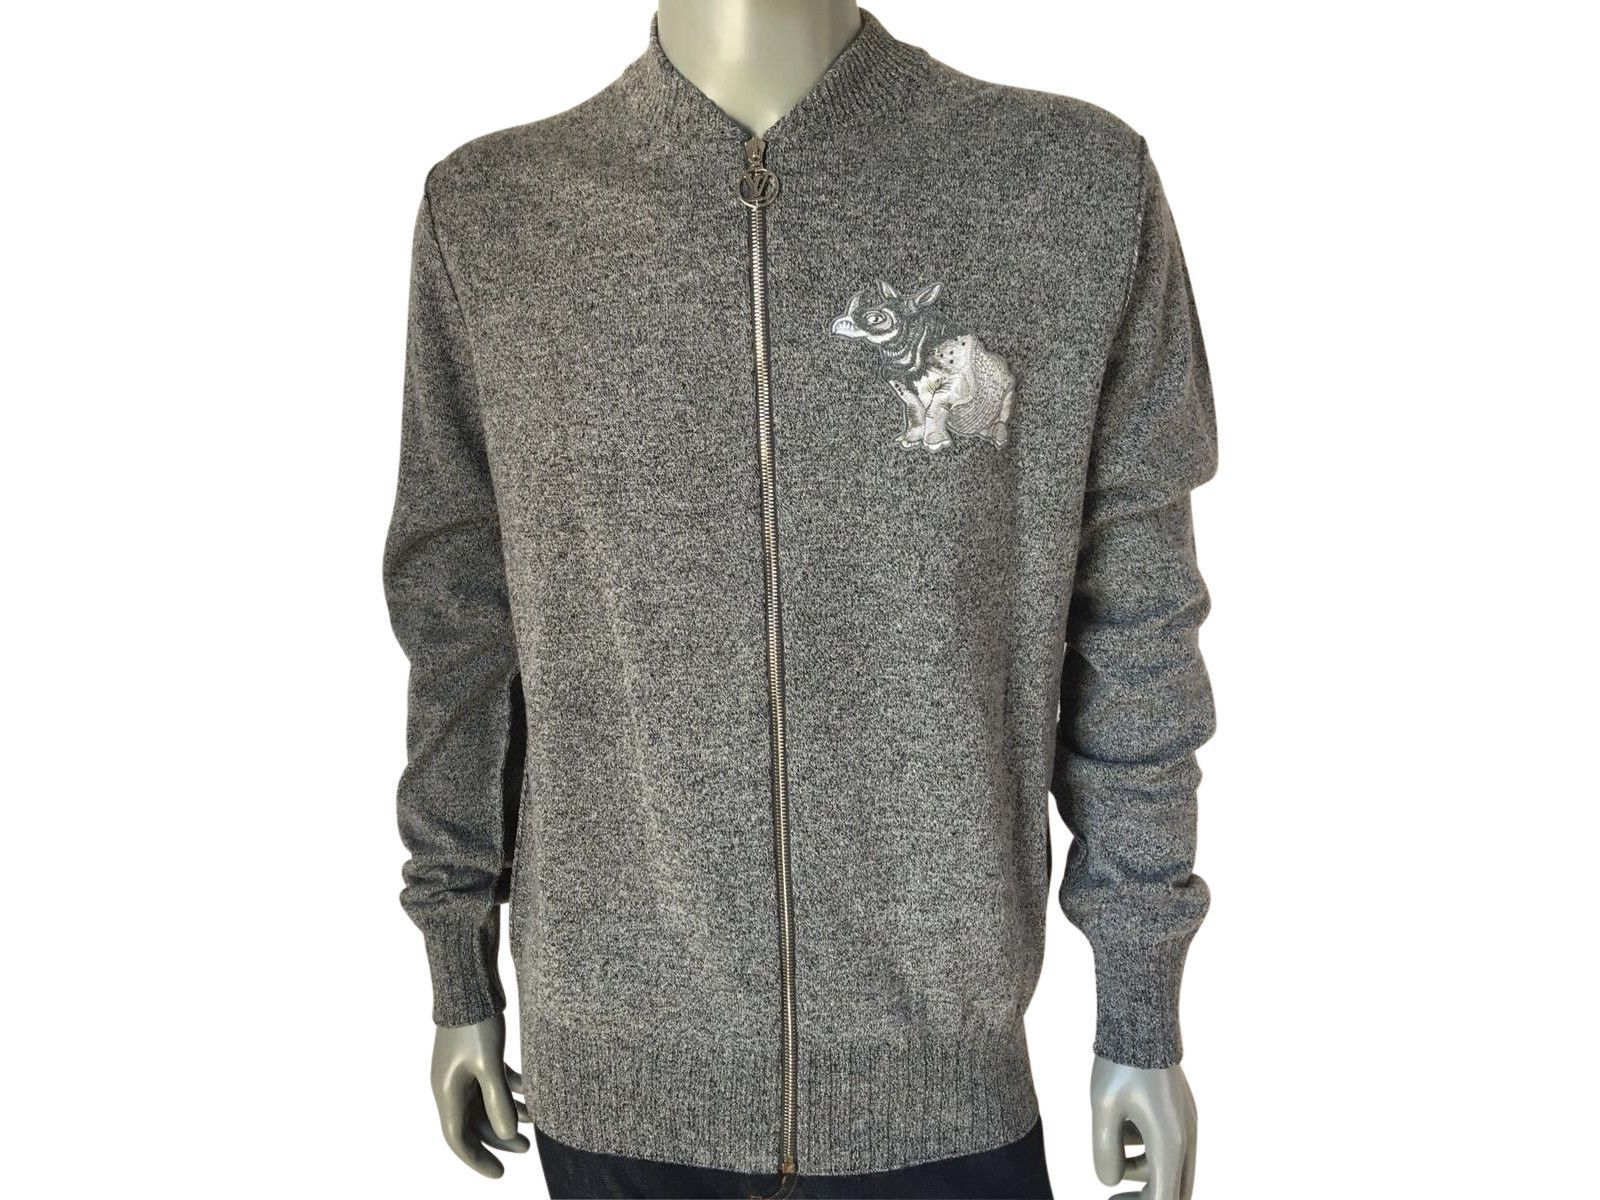 b5aef4b728b3 Louis Vuitton Chapman Rhinoceros Patch Sweater